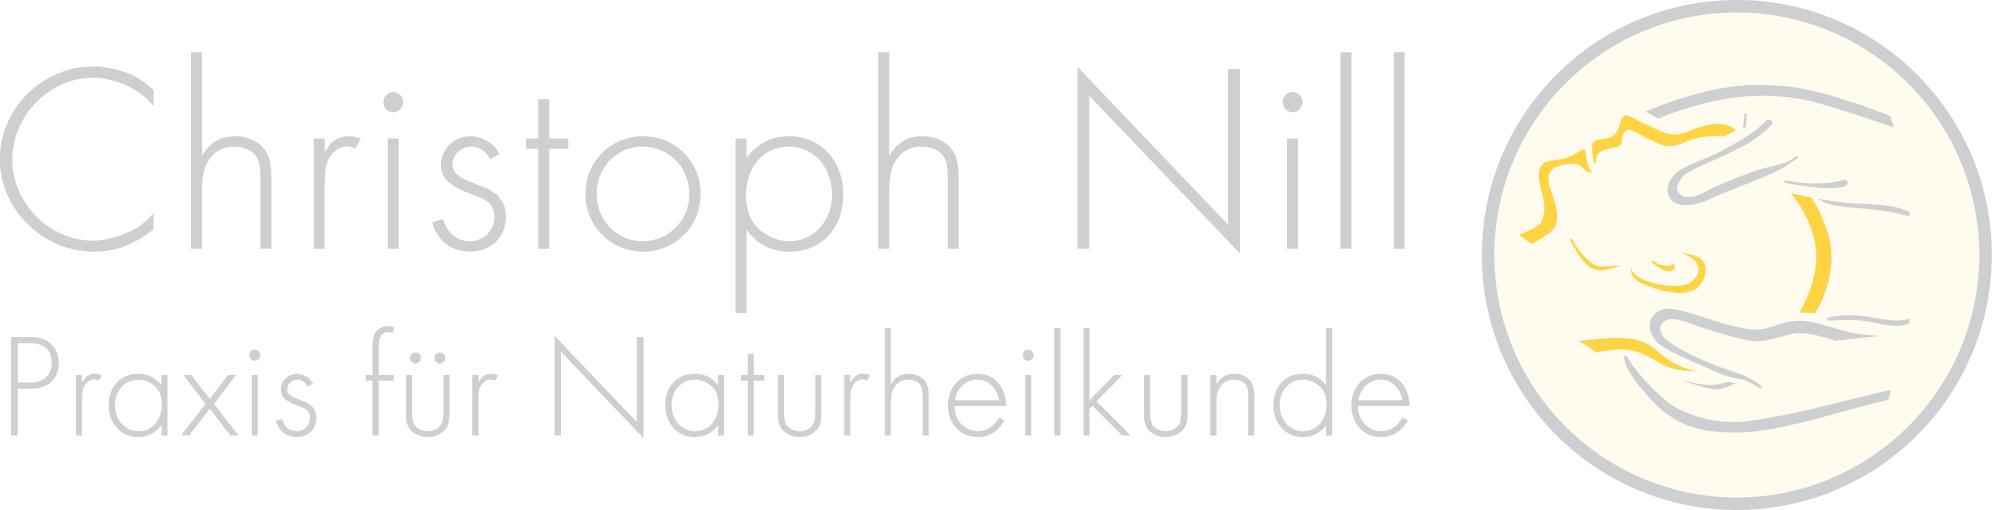 Christoph Nill